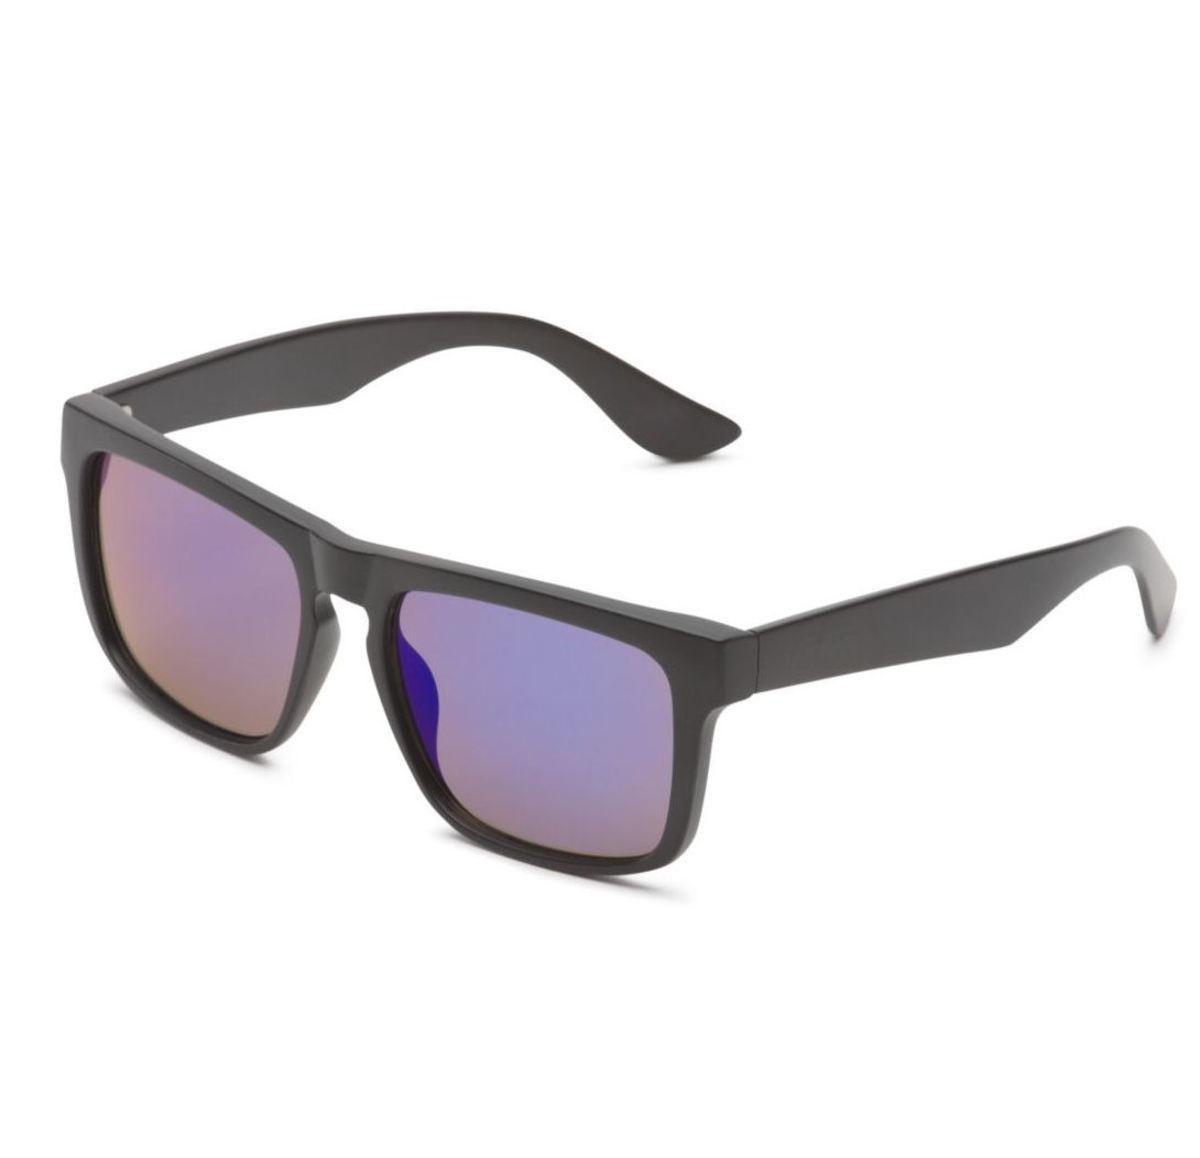 occhiali da sole vans